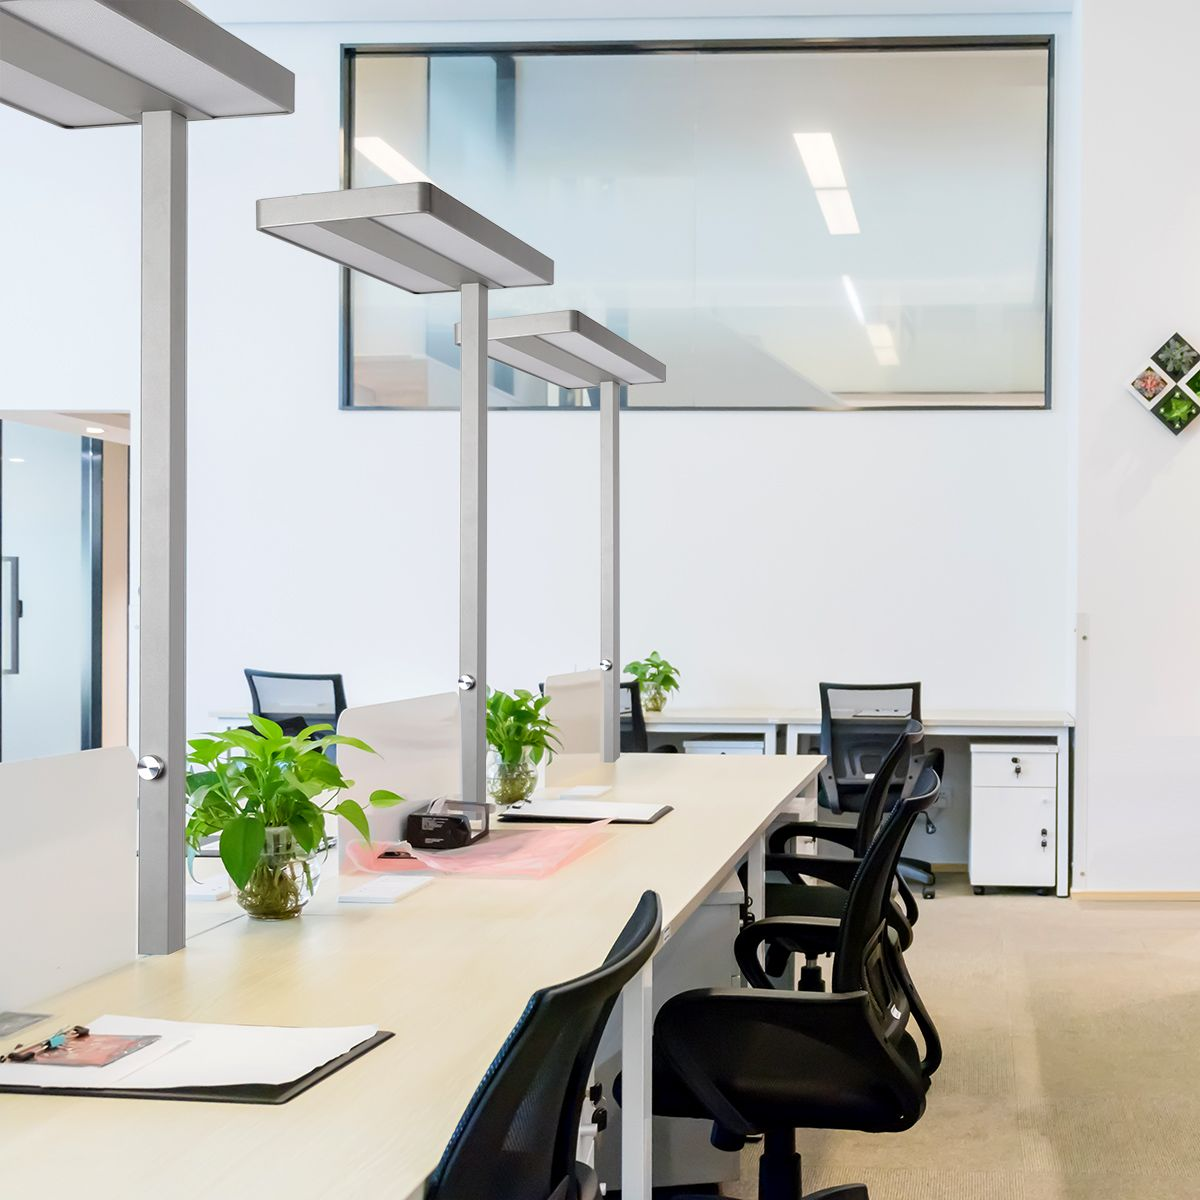 60W Dimmable Neutral White LED Floor Lamp for Living Room, Bedroom ...